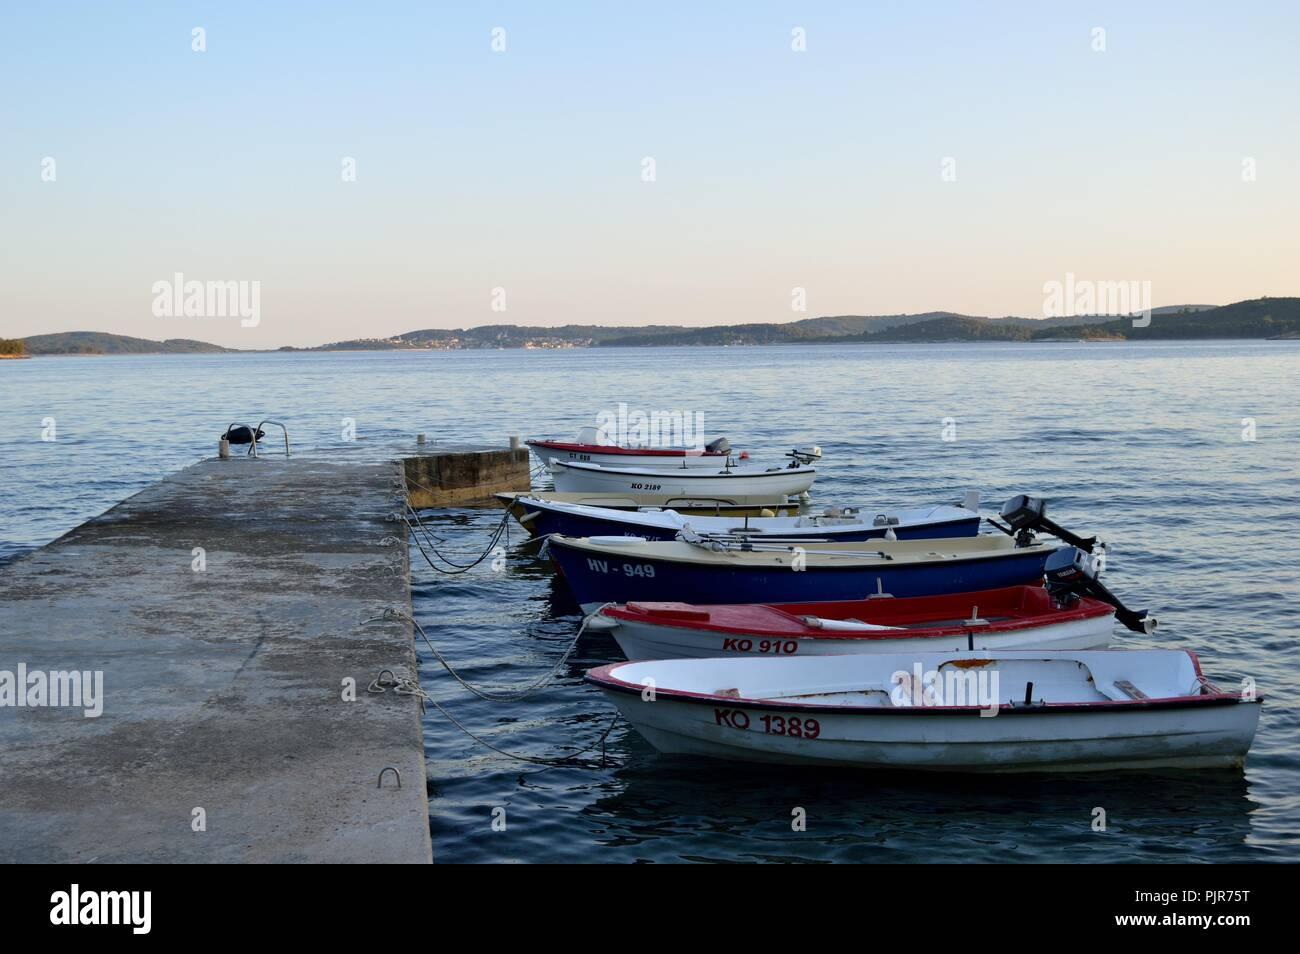 images of Croatia - Stock Image